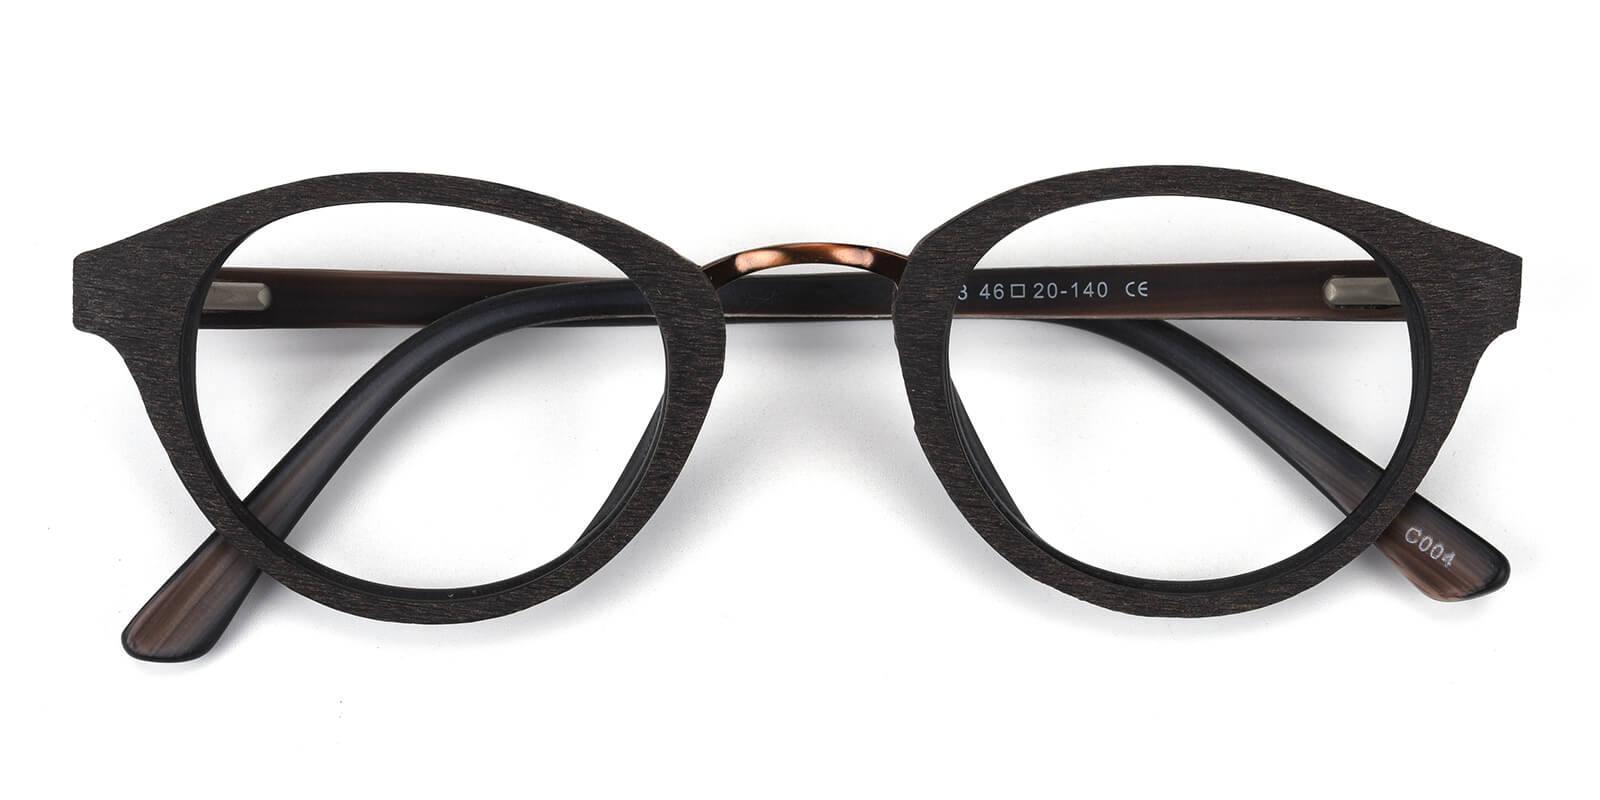 Haiden-Brown-Oval-Acetate-Eyeglasses-detail